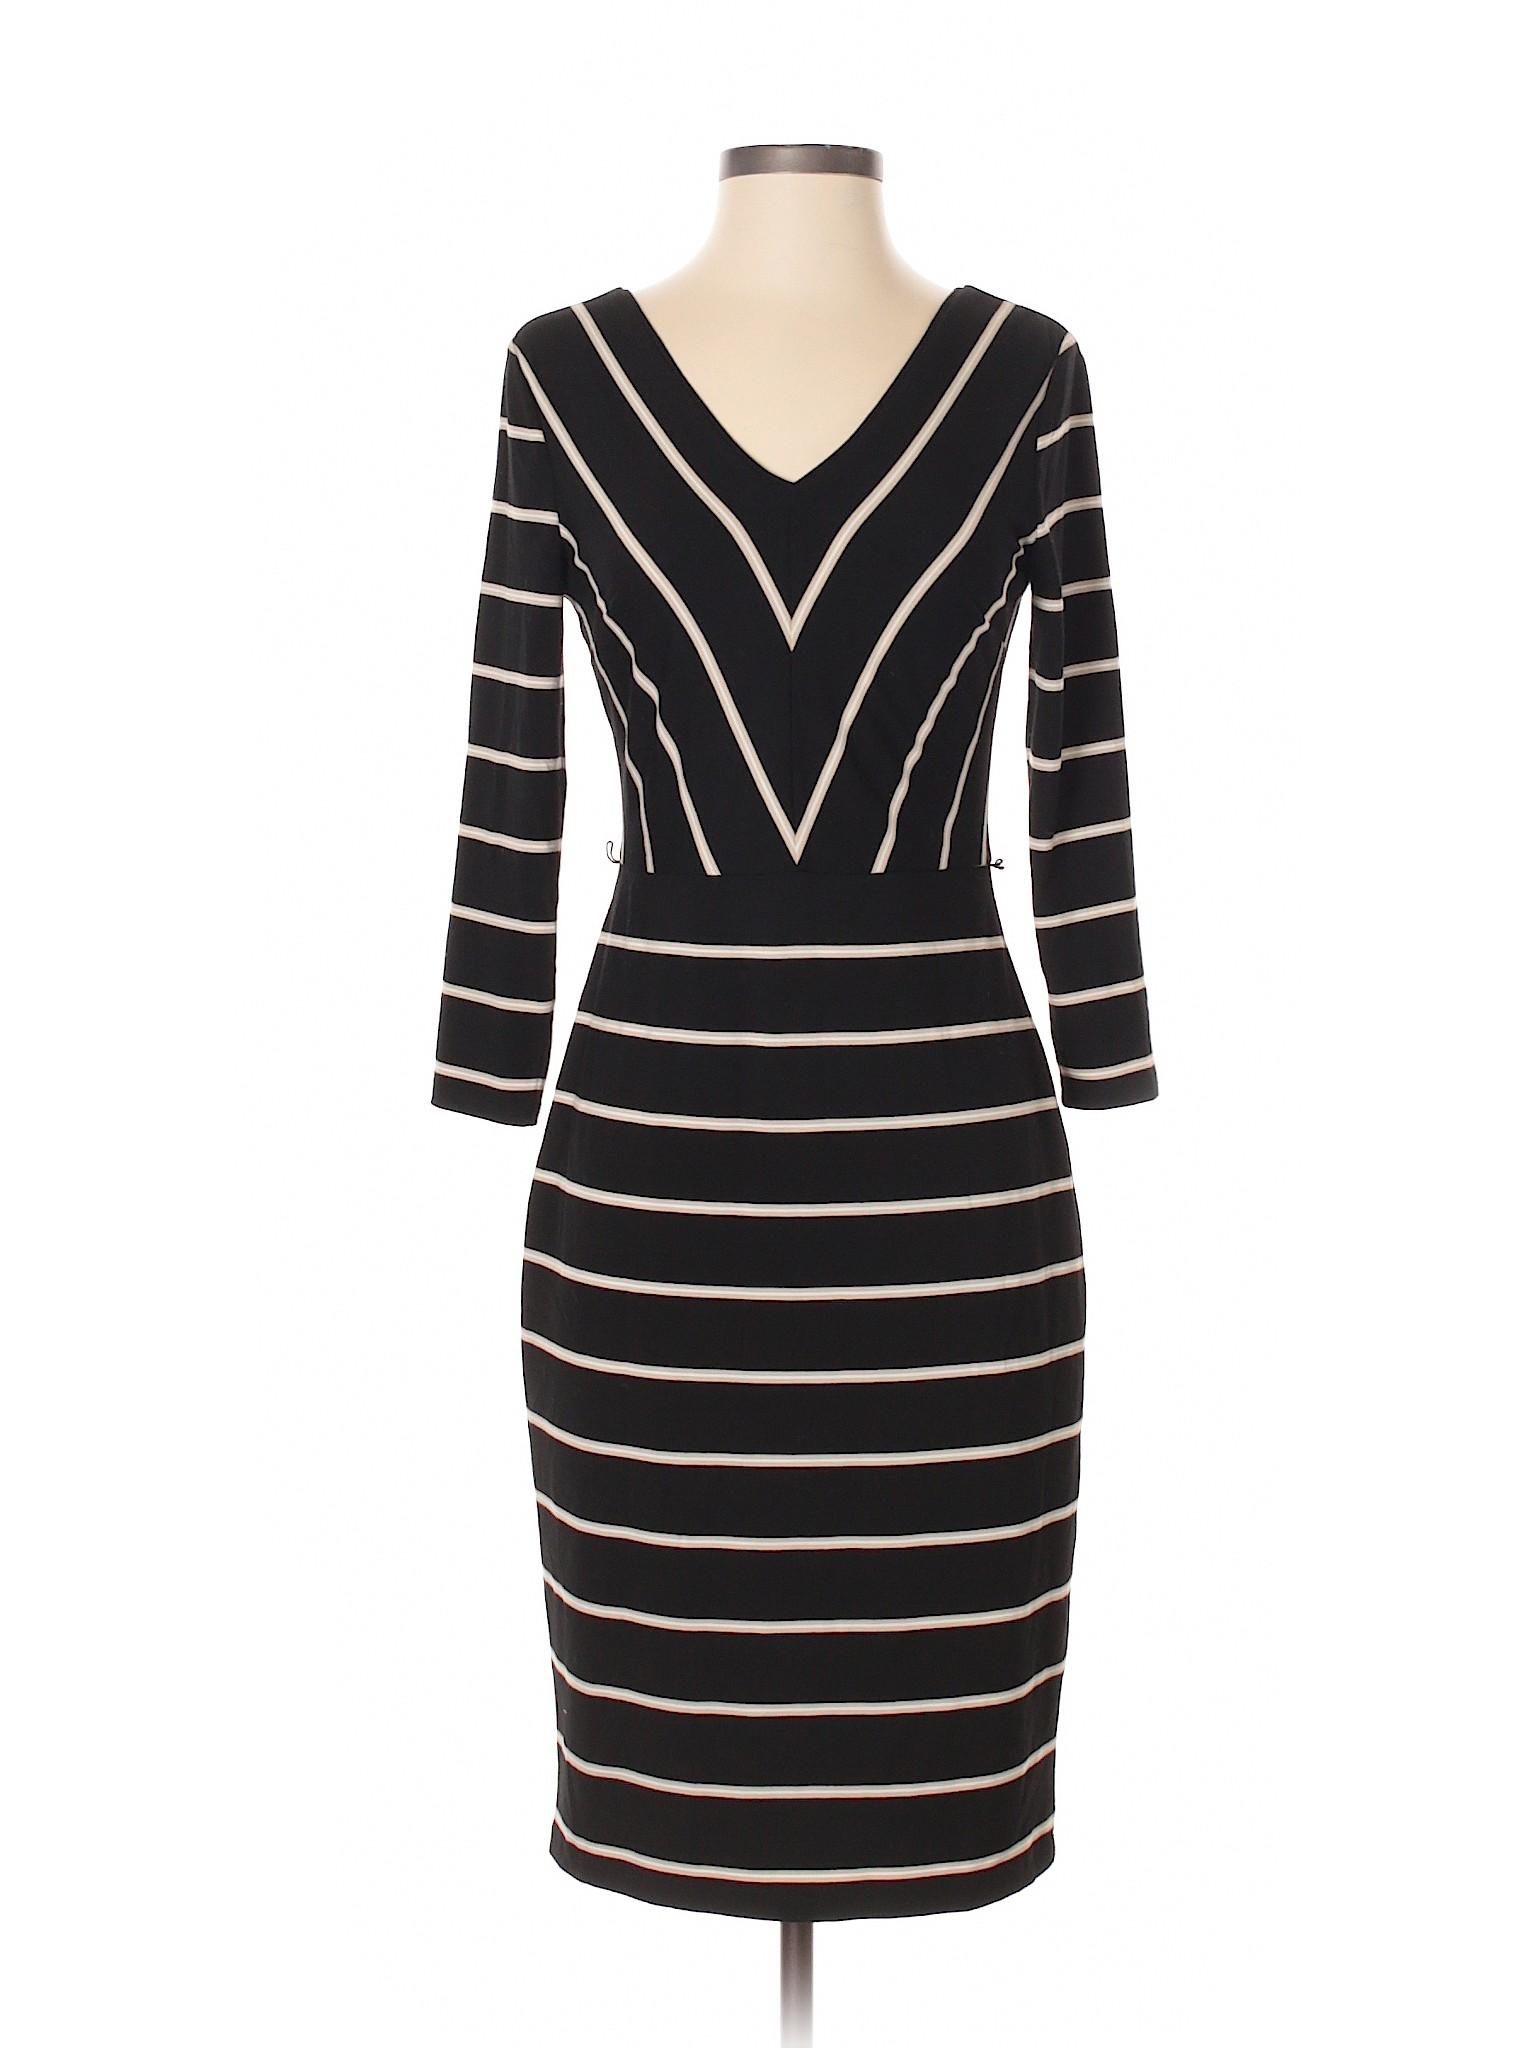 Selling Market Casual White House Dress Black rqrvt